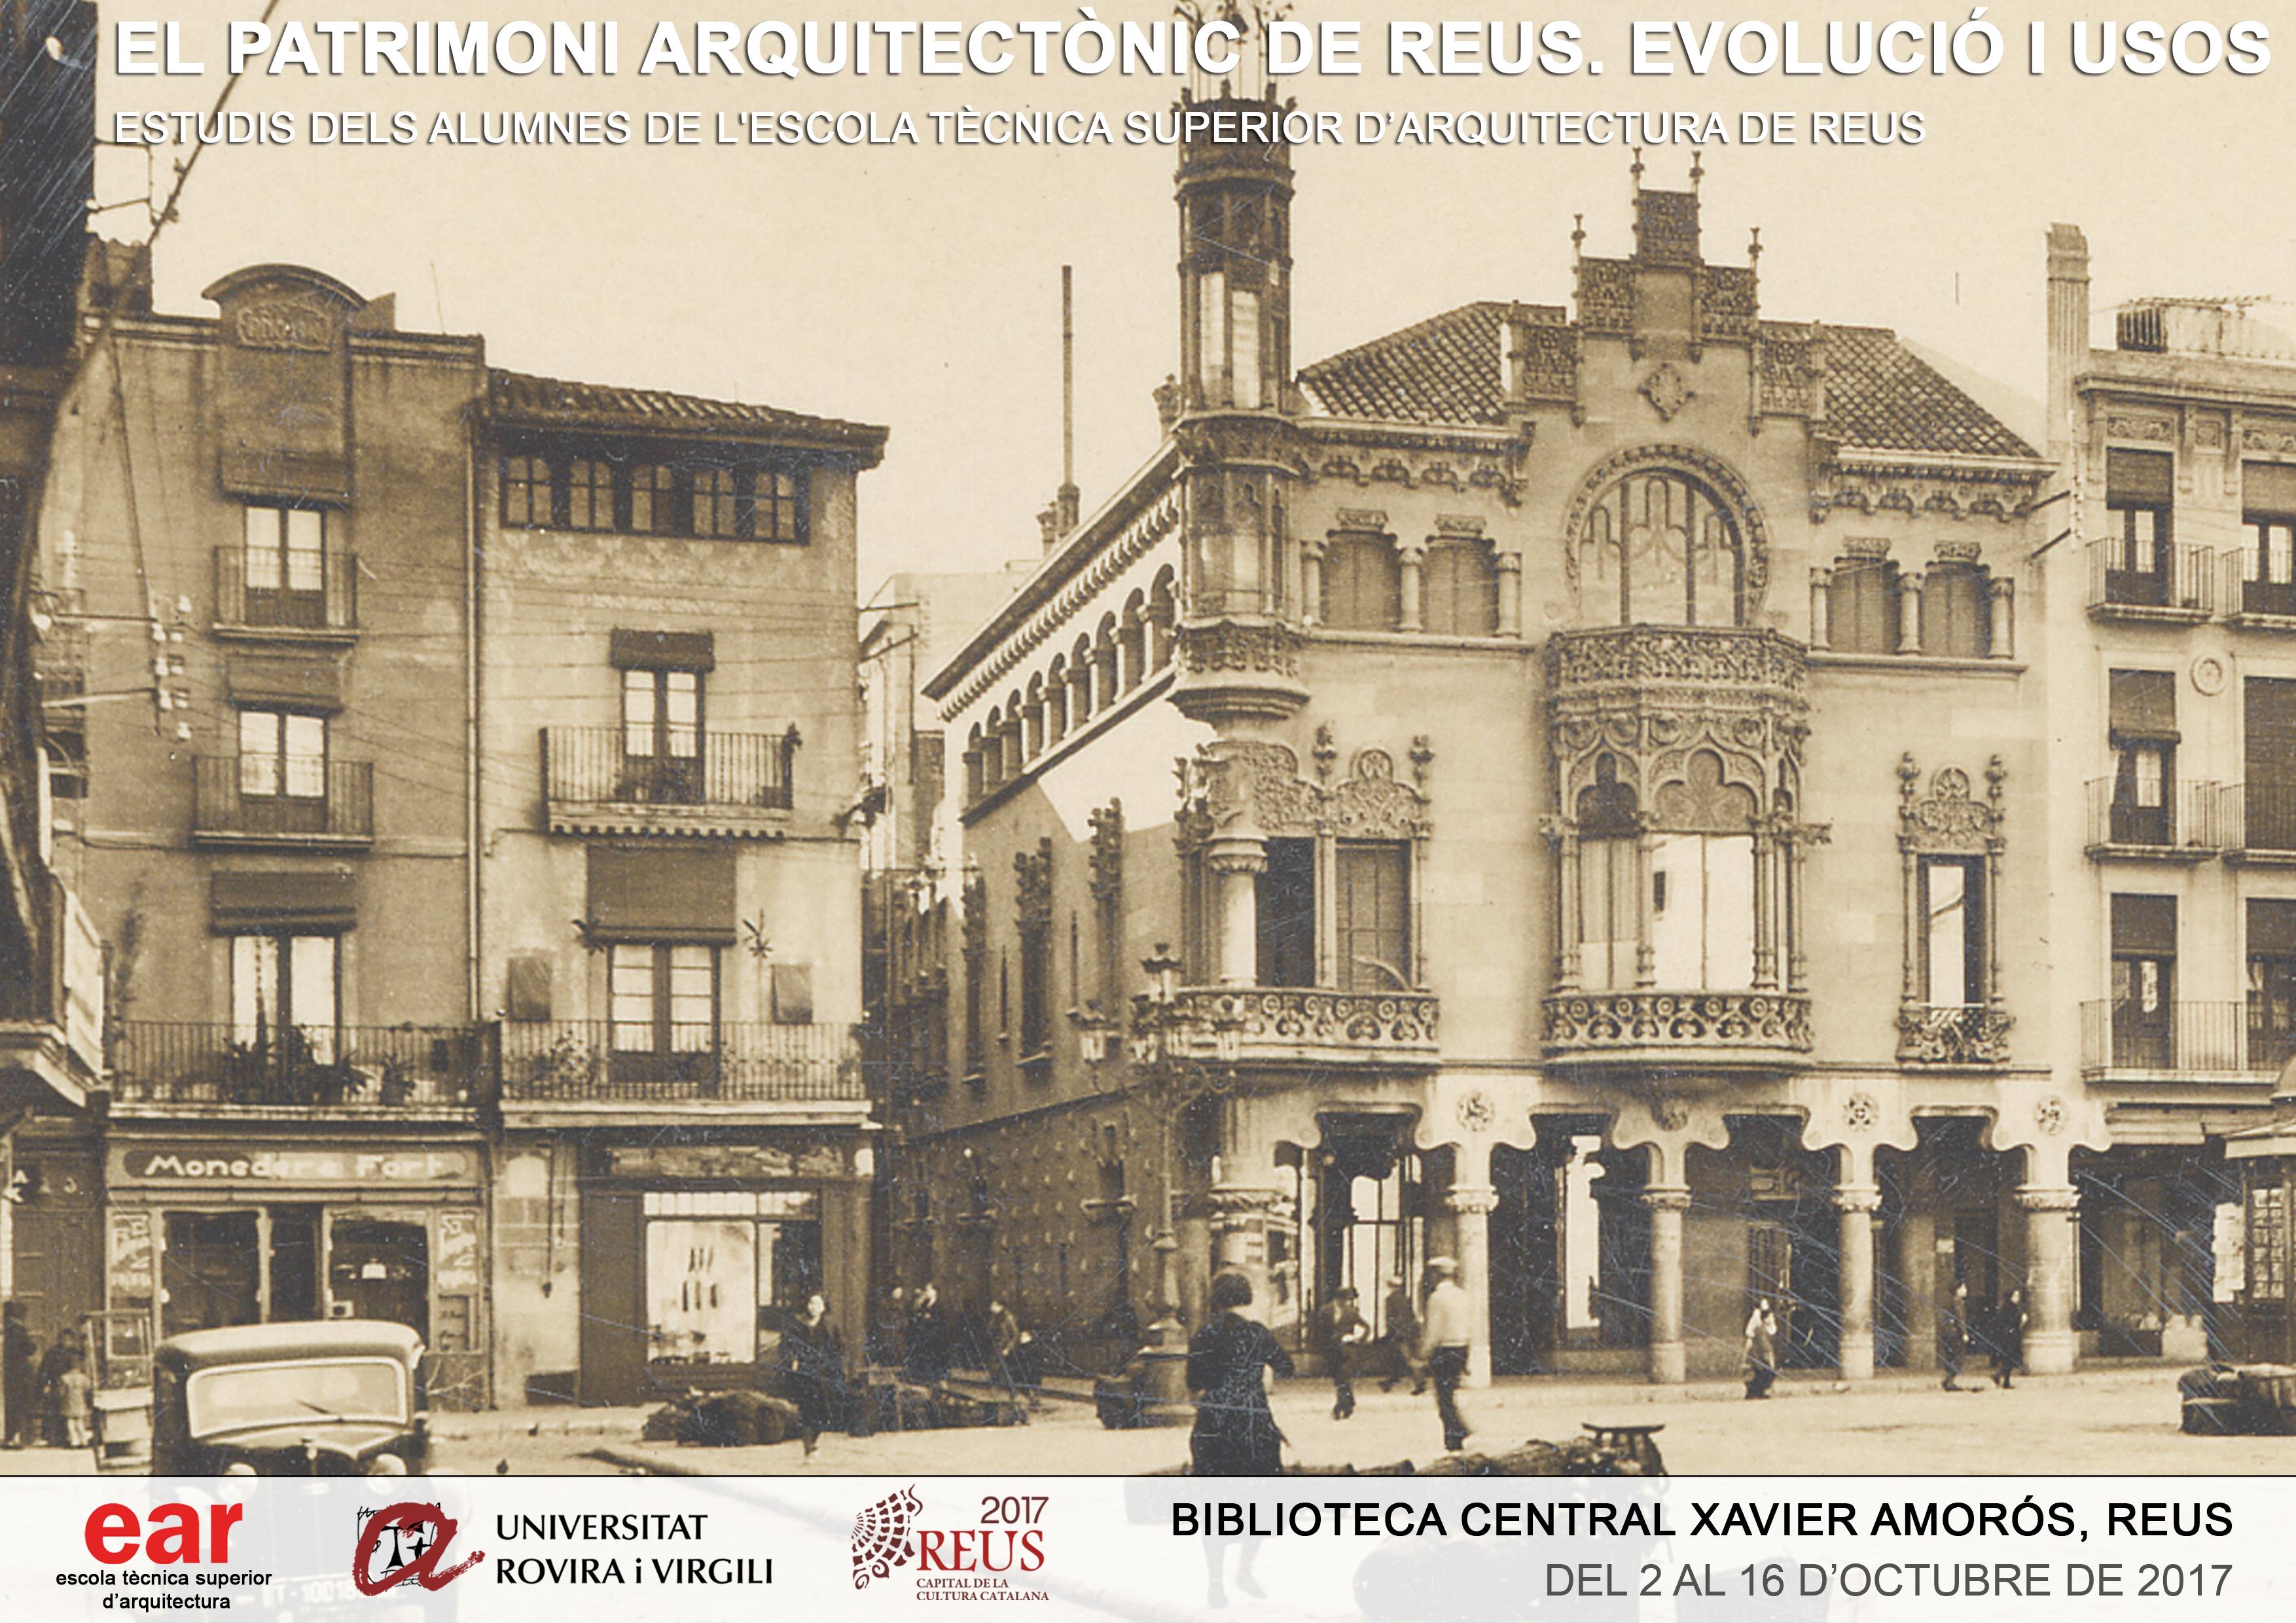 El patrimoni arquitectònic de Reus